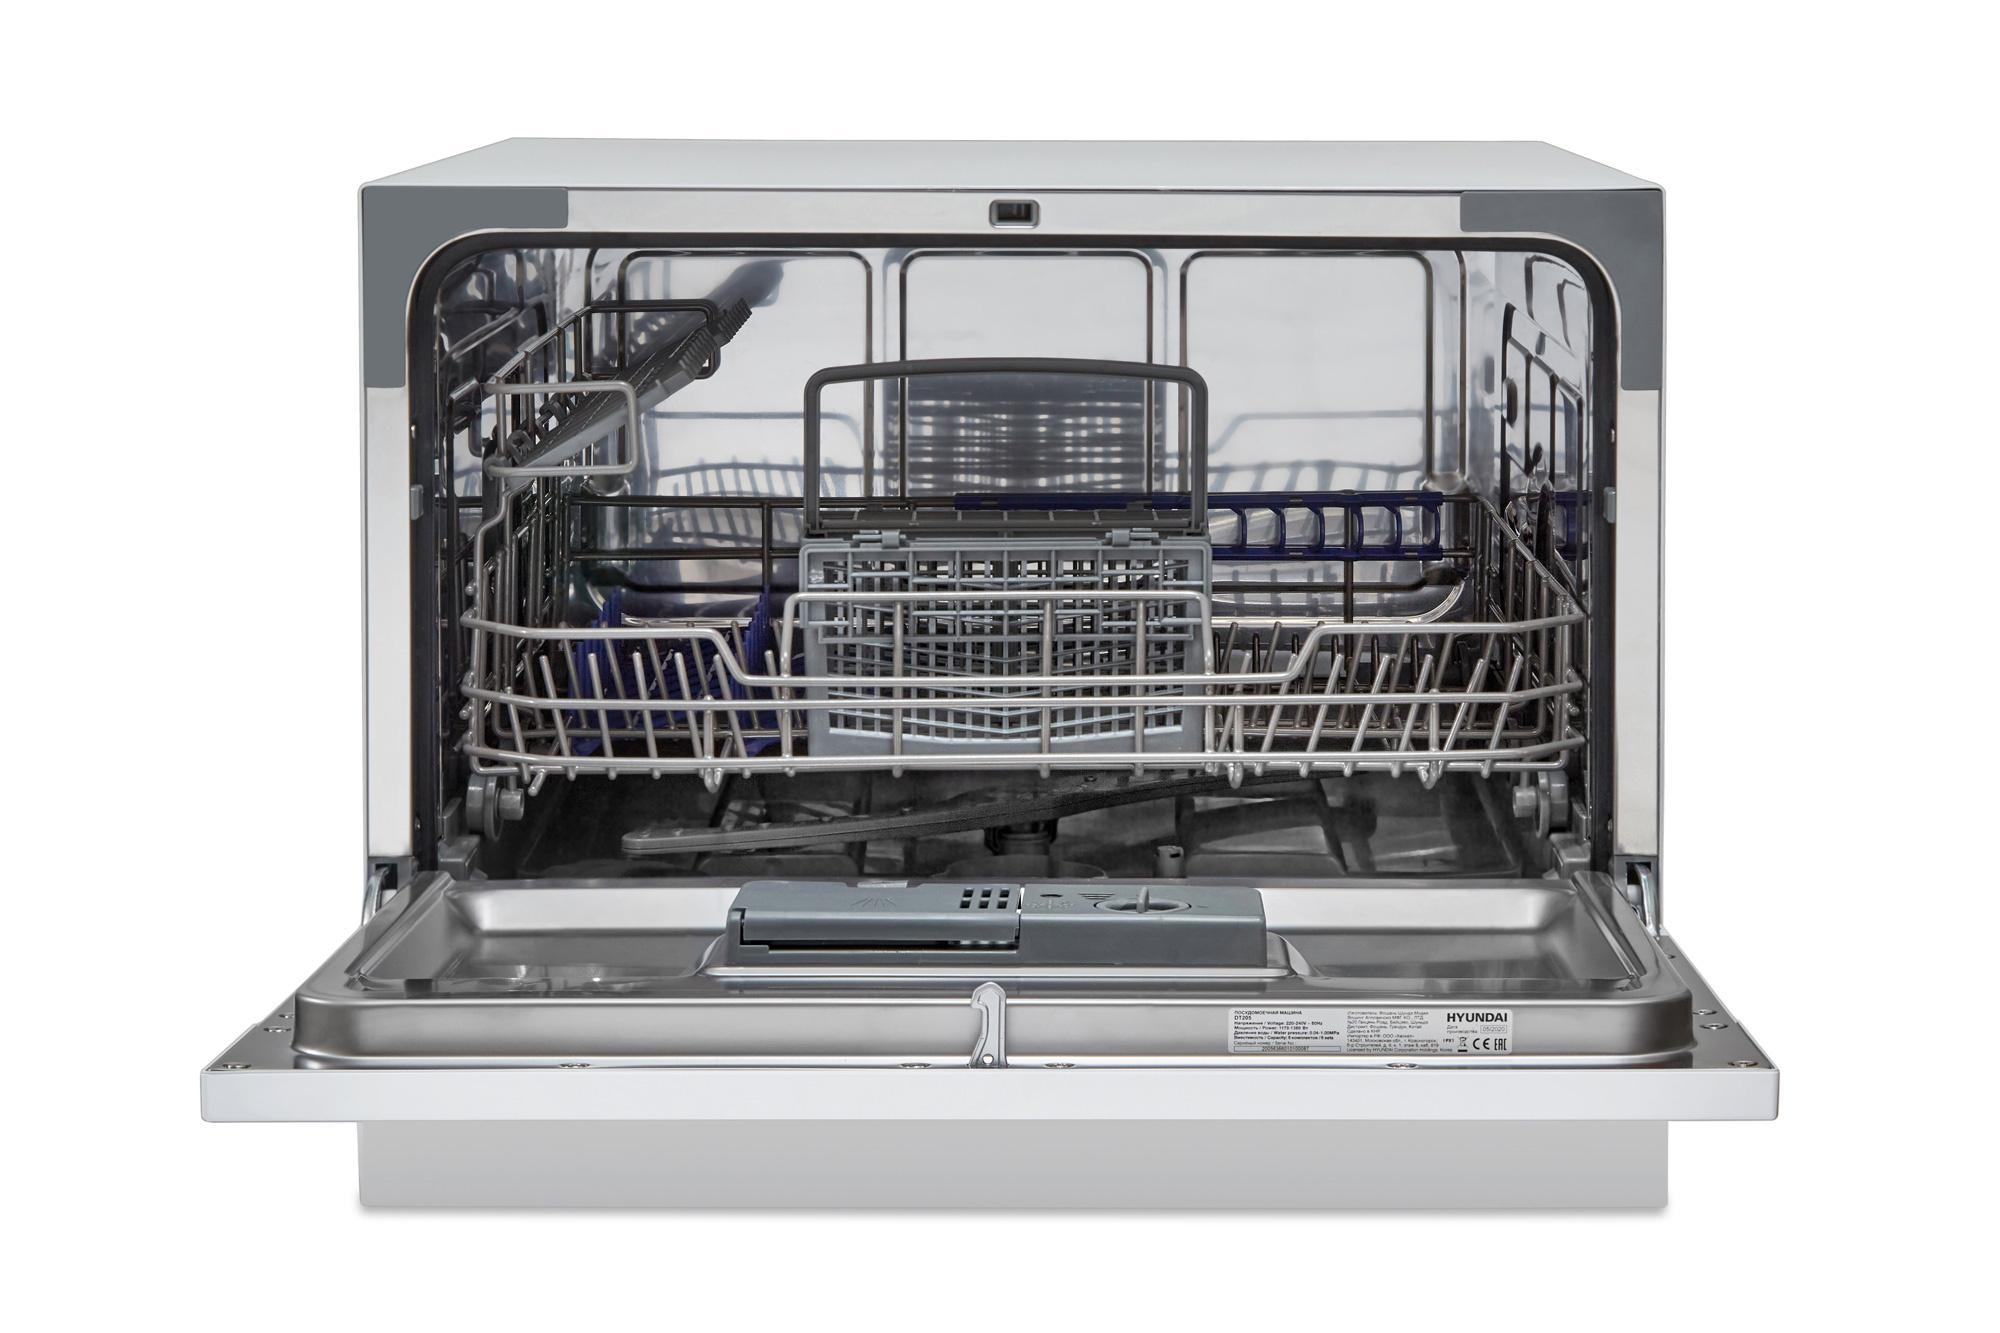 Посудомоечная машина Hyundai DT205 белый (компактная)